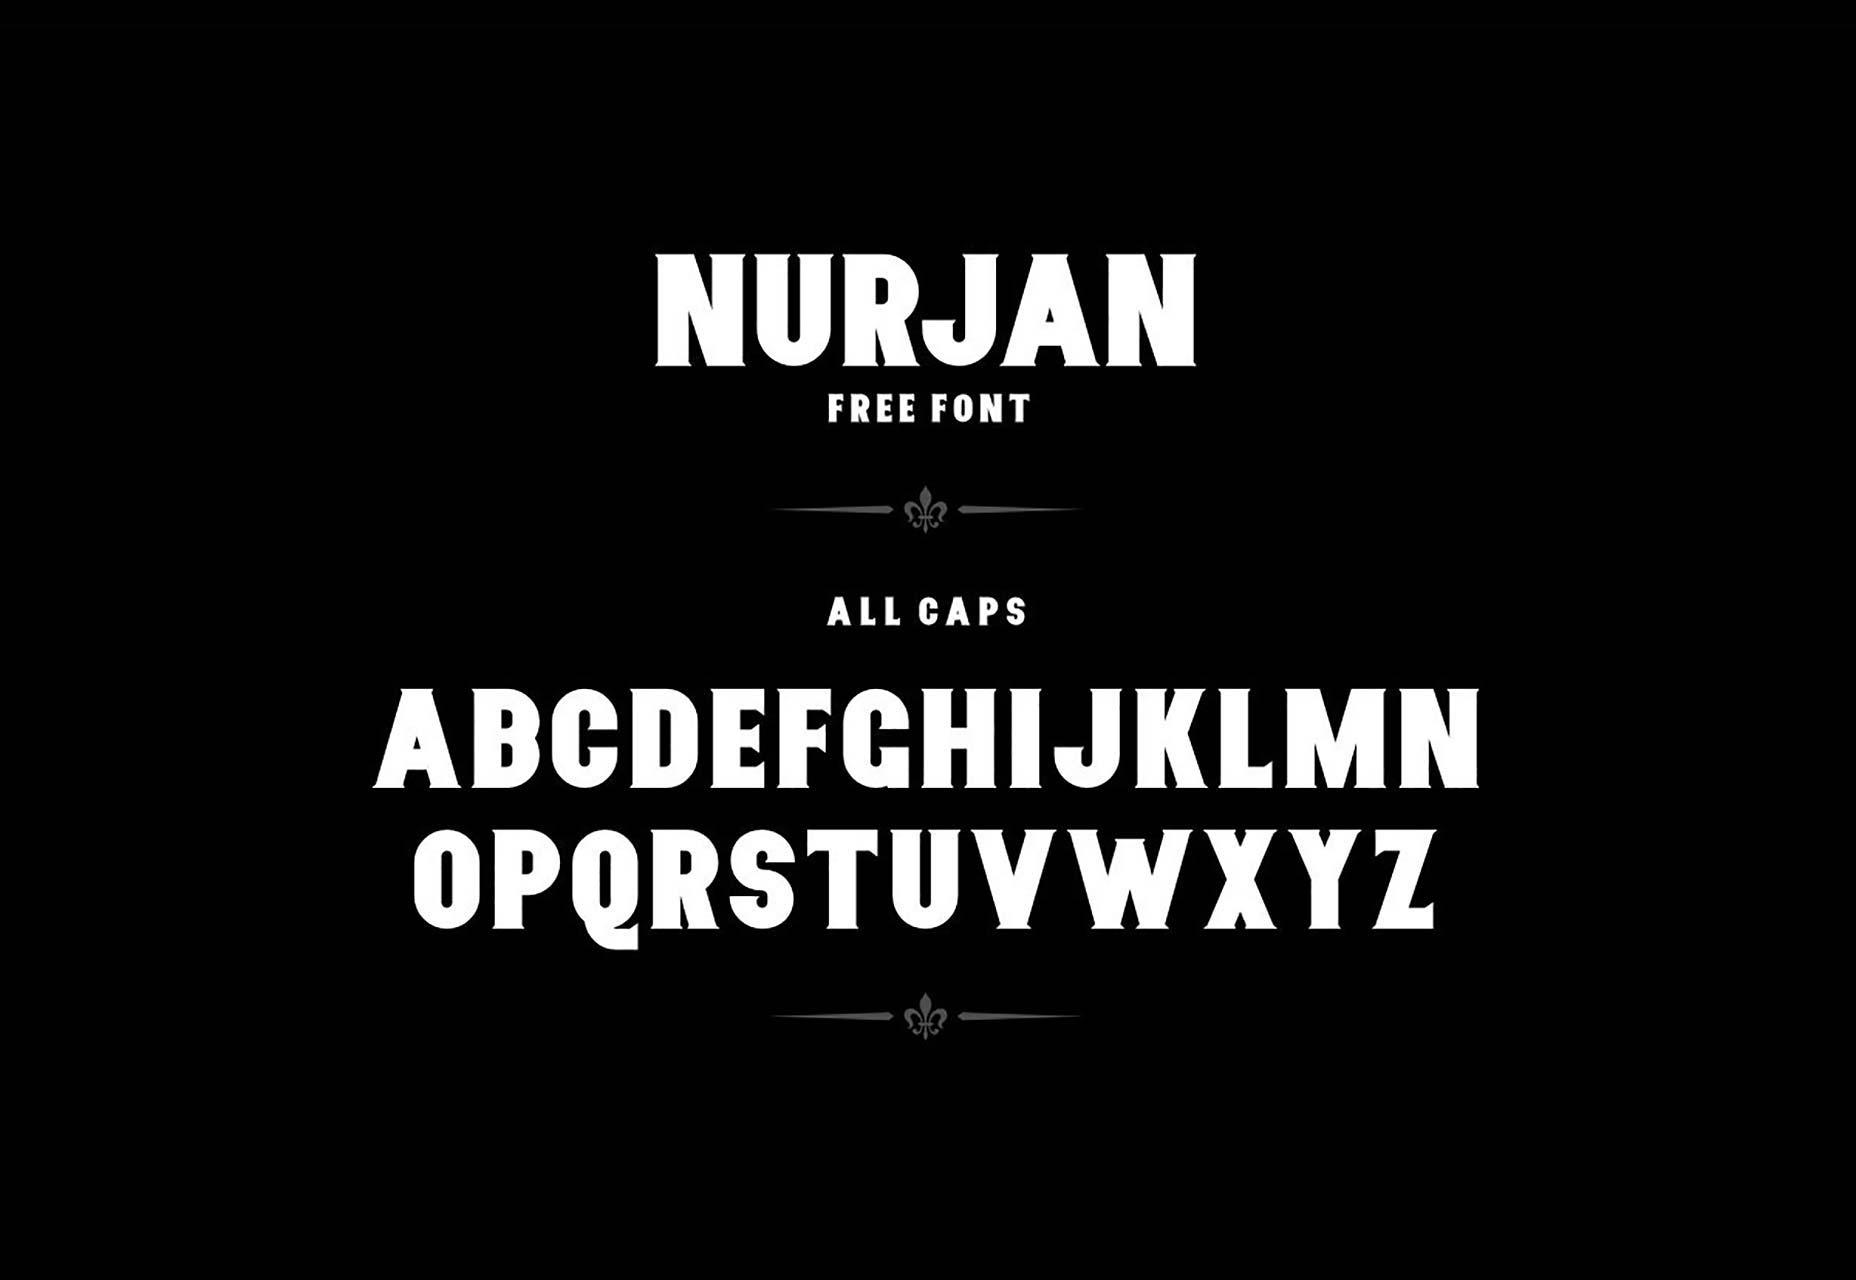 014_nurjan